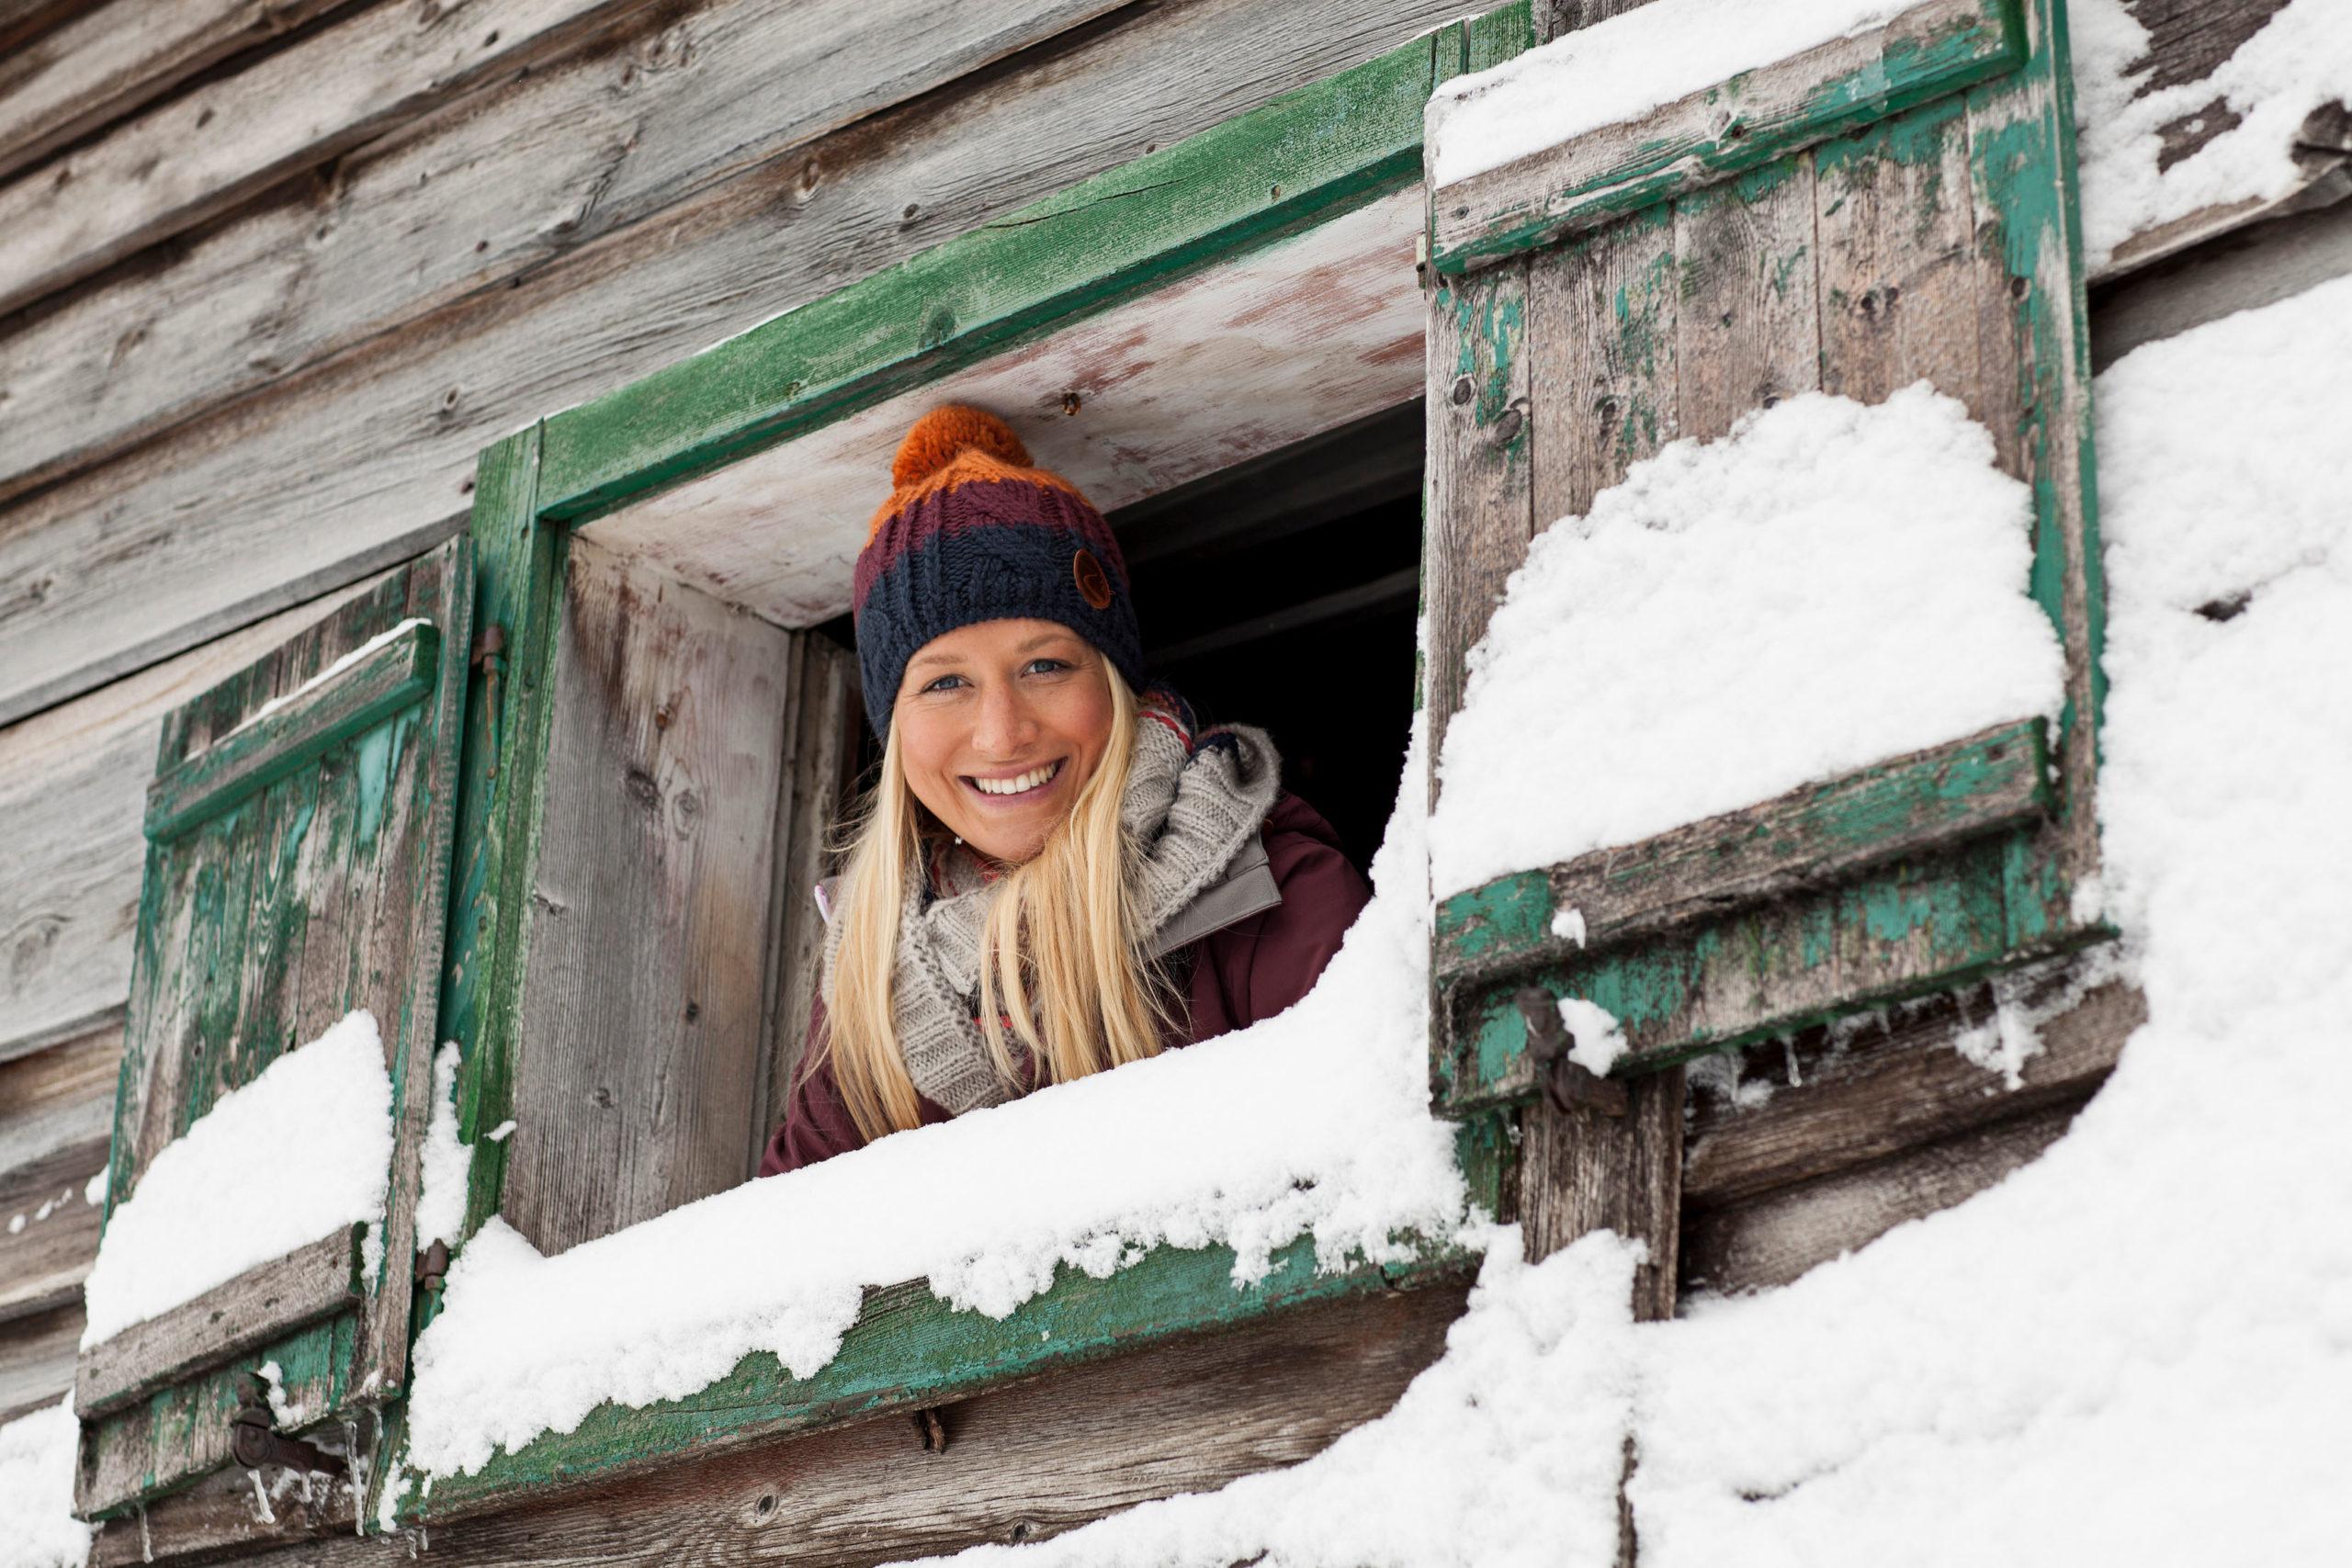 Fotomotive im Winterurlaub